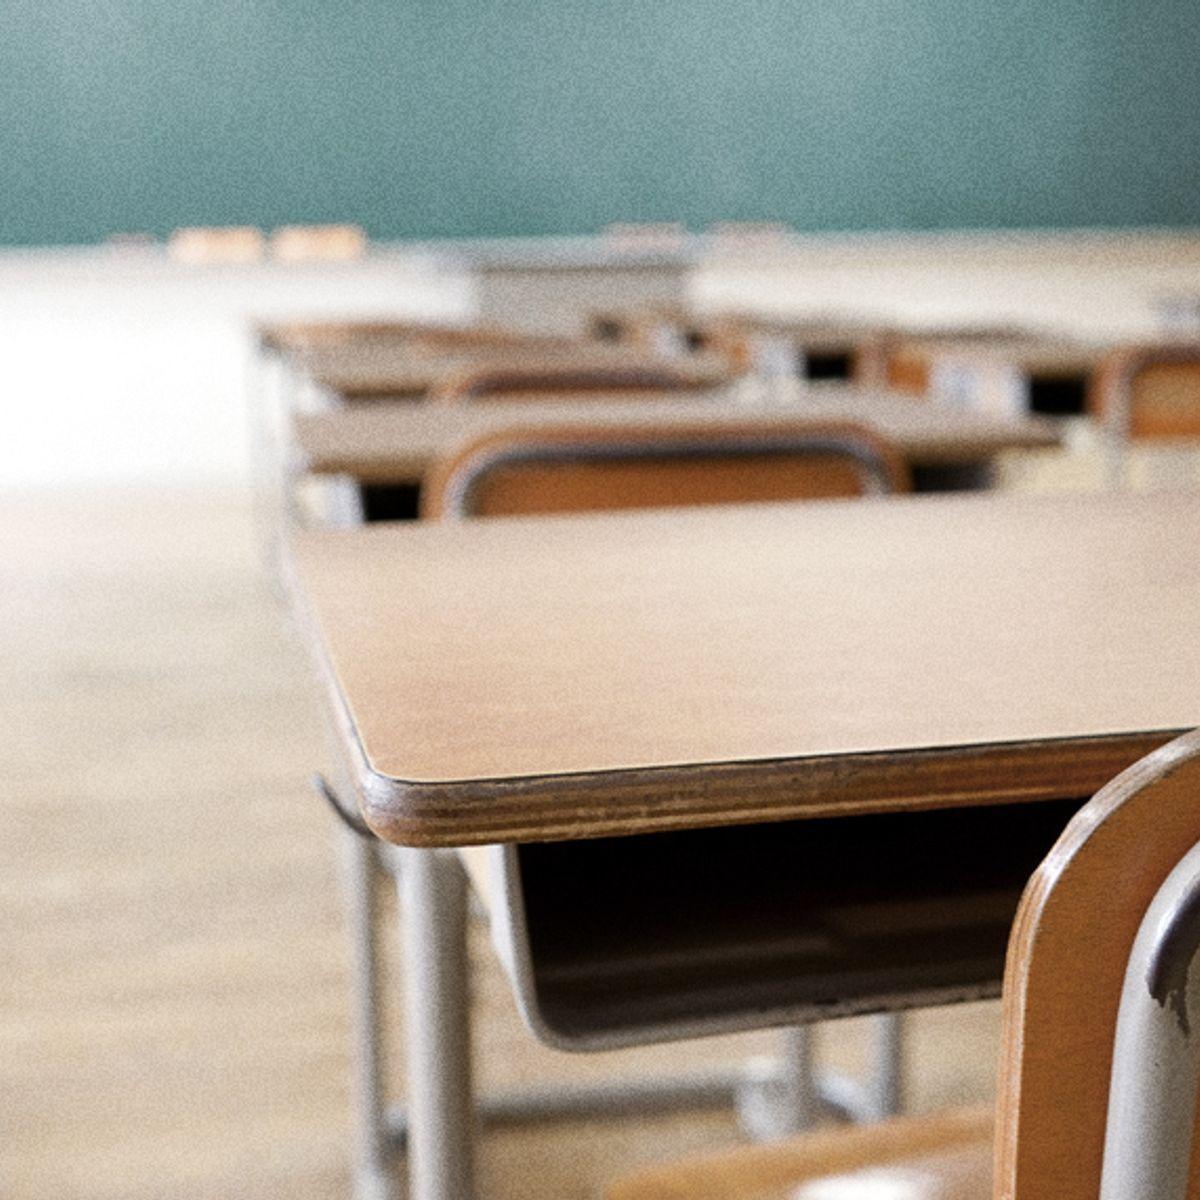 How billionaire charter school funders corrupted the school leadership pipeline